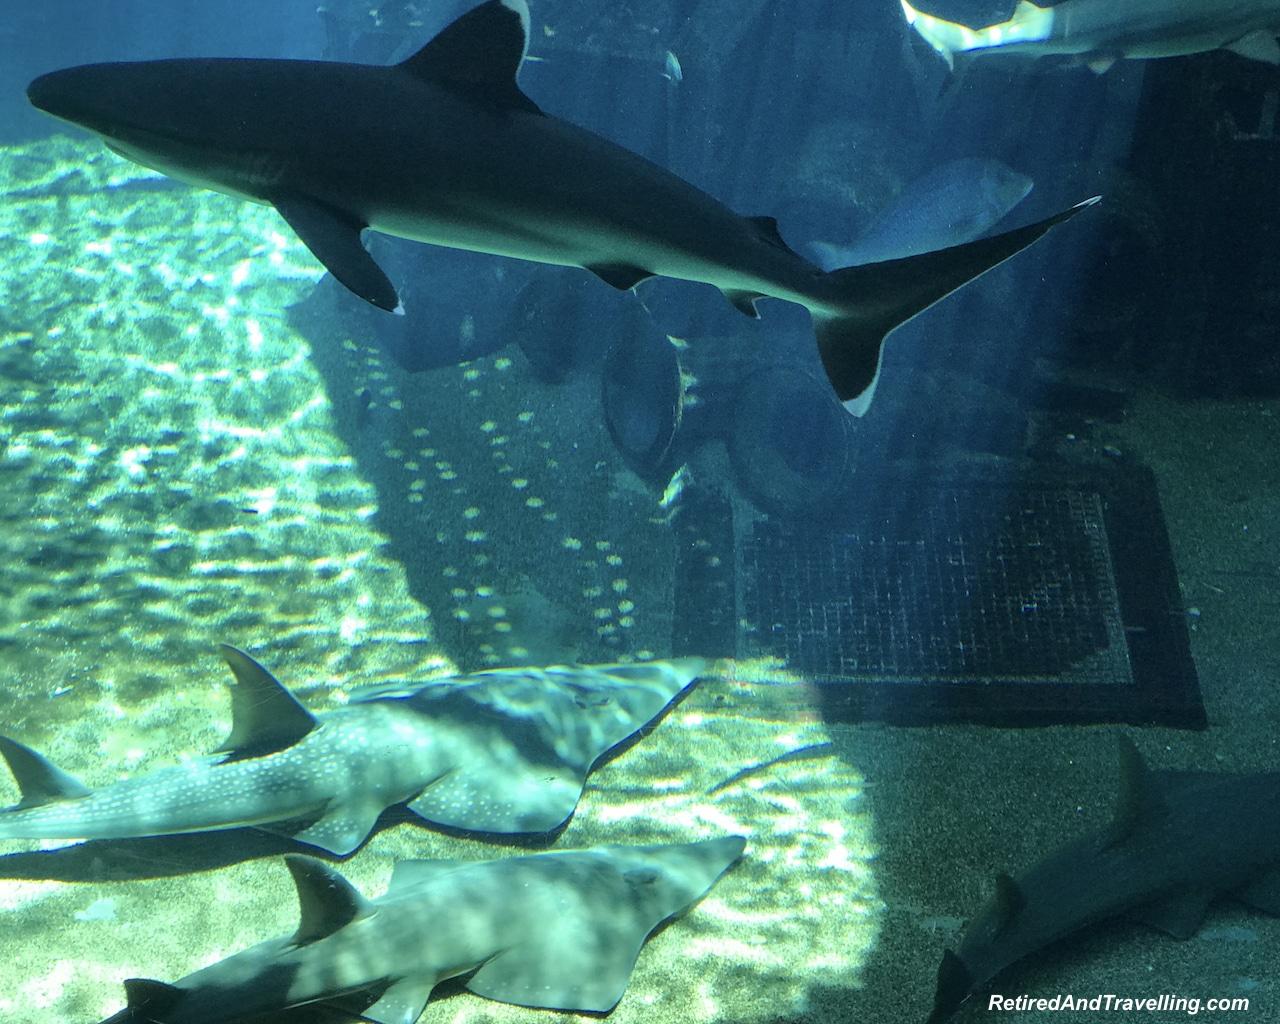 Durban Beach Cargo Hold Sharks - Enjoy The Beach in Durban.jpg